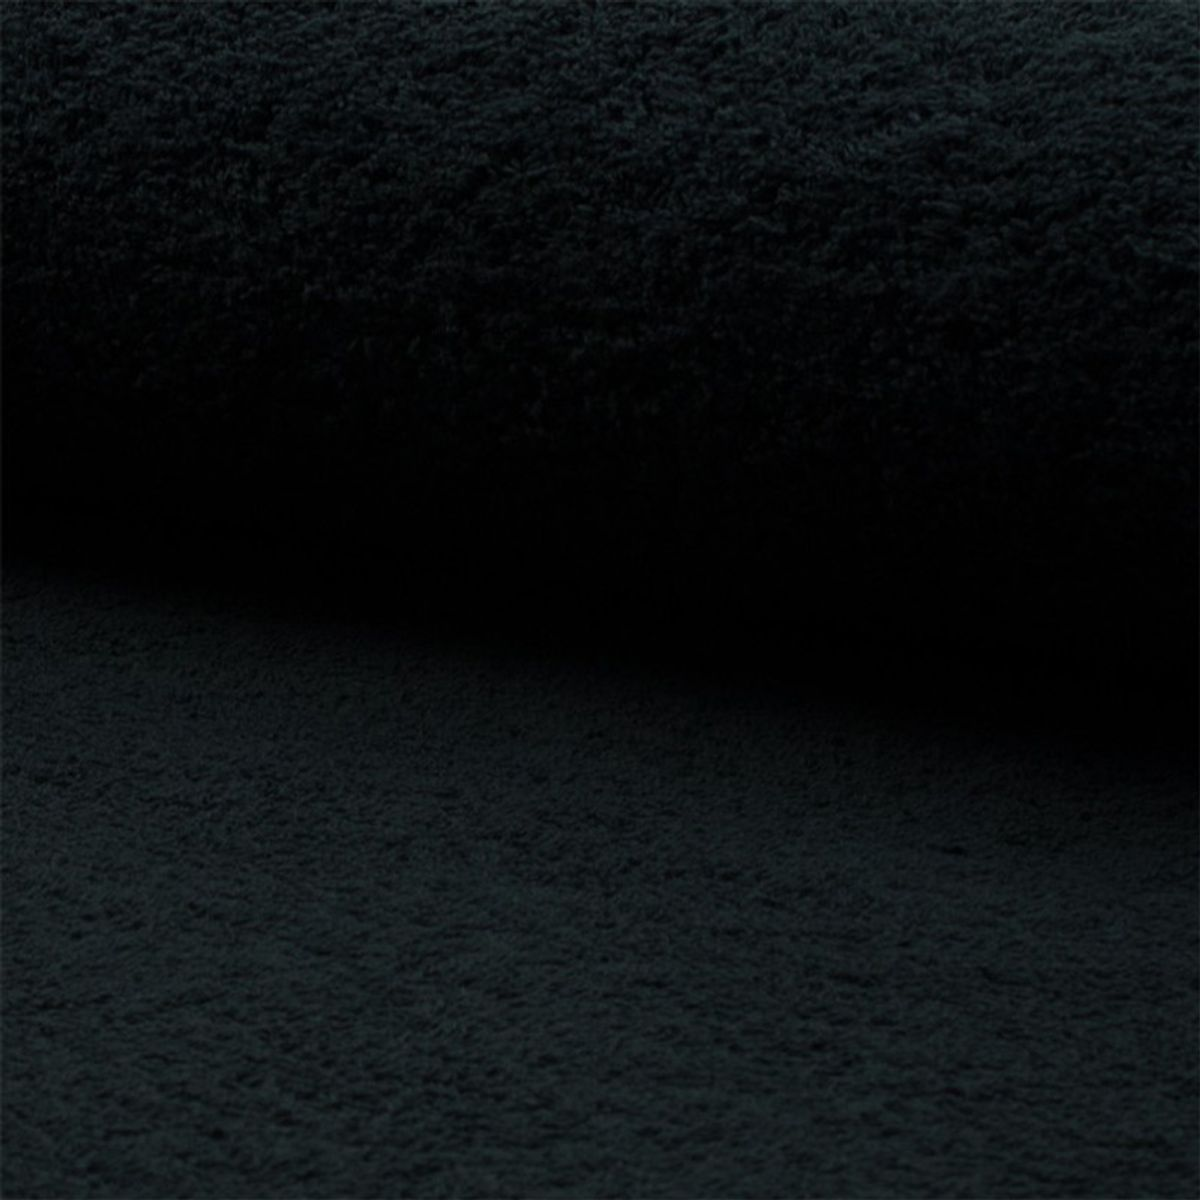 Tissu éponge - Noir